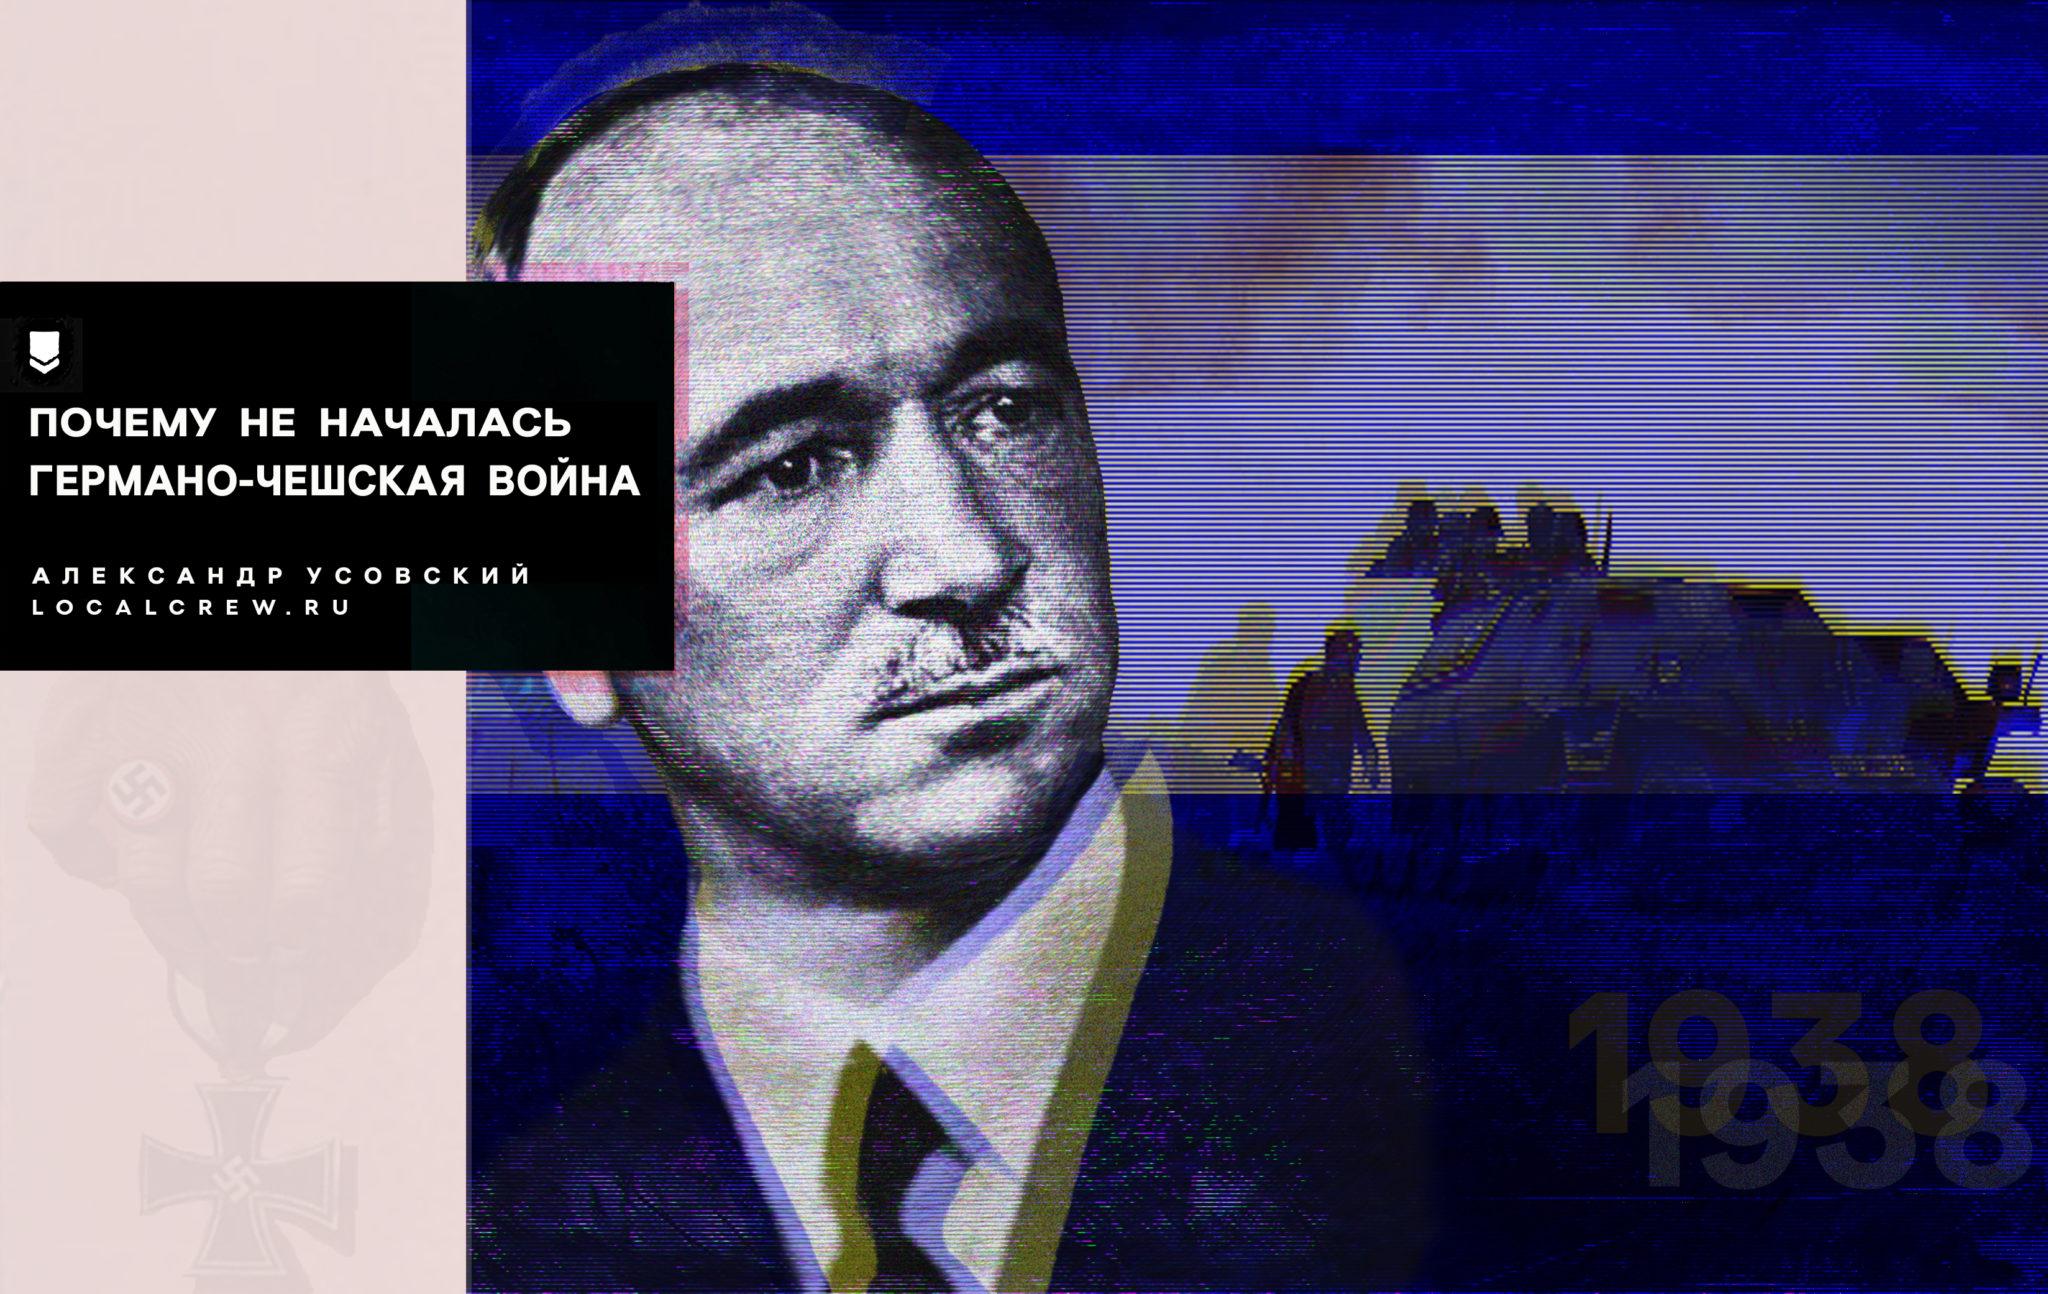 Сентябрь 1938-го: почему не началась германо-чешская война?